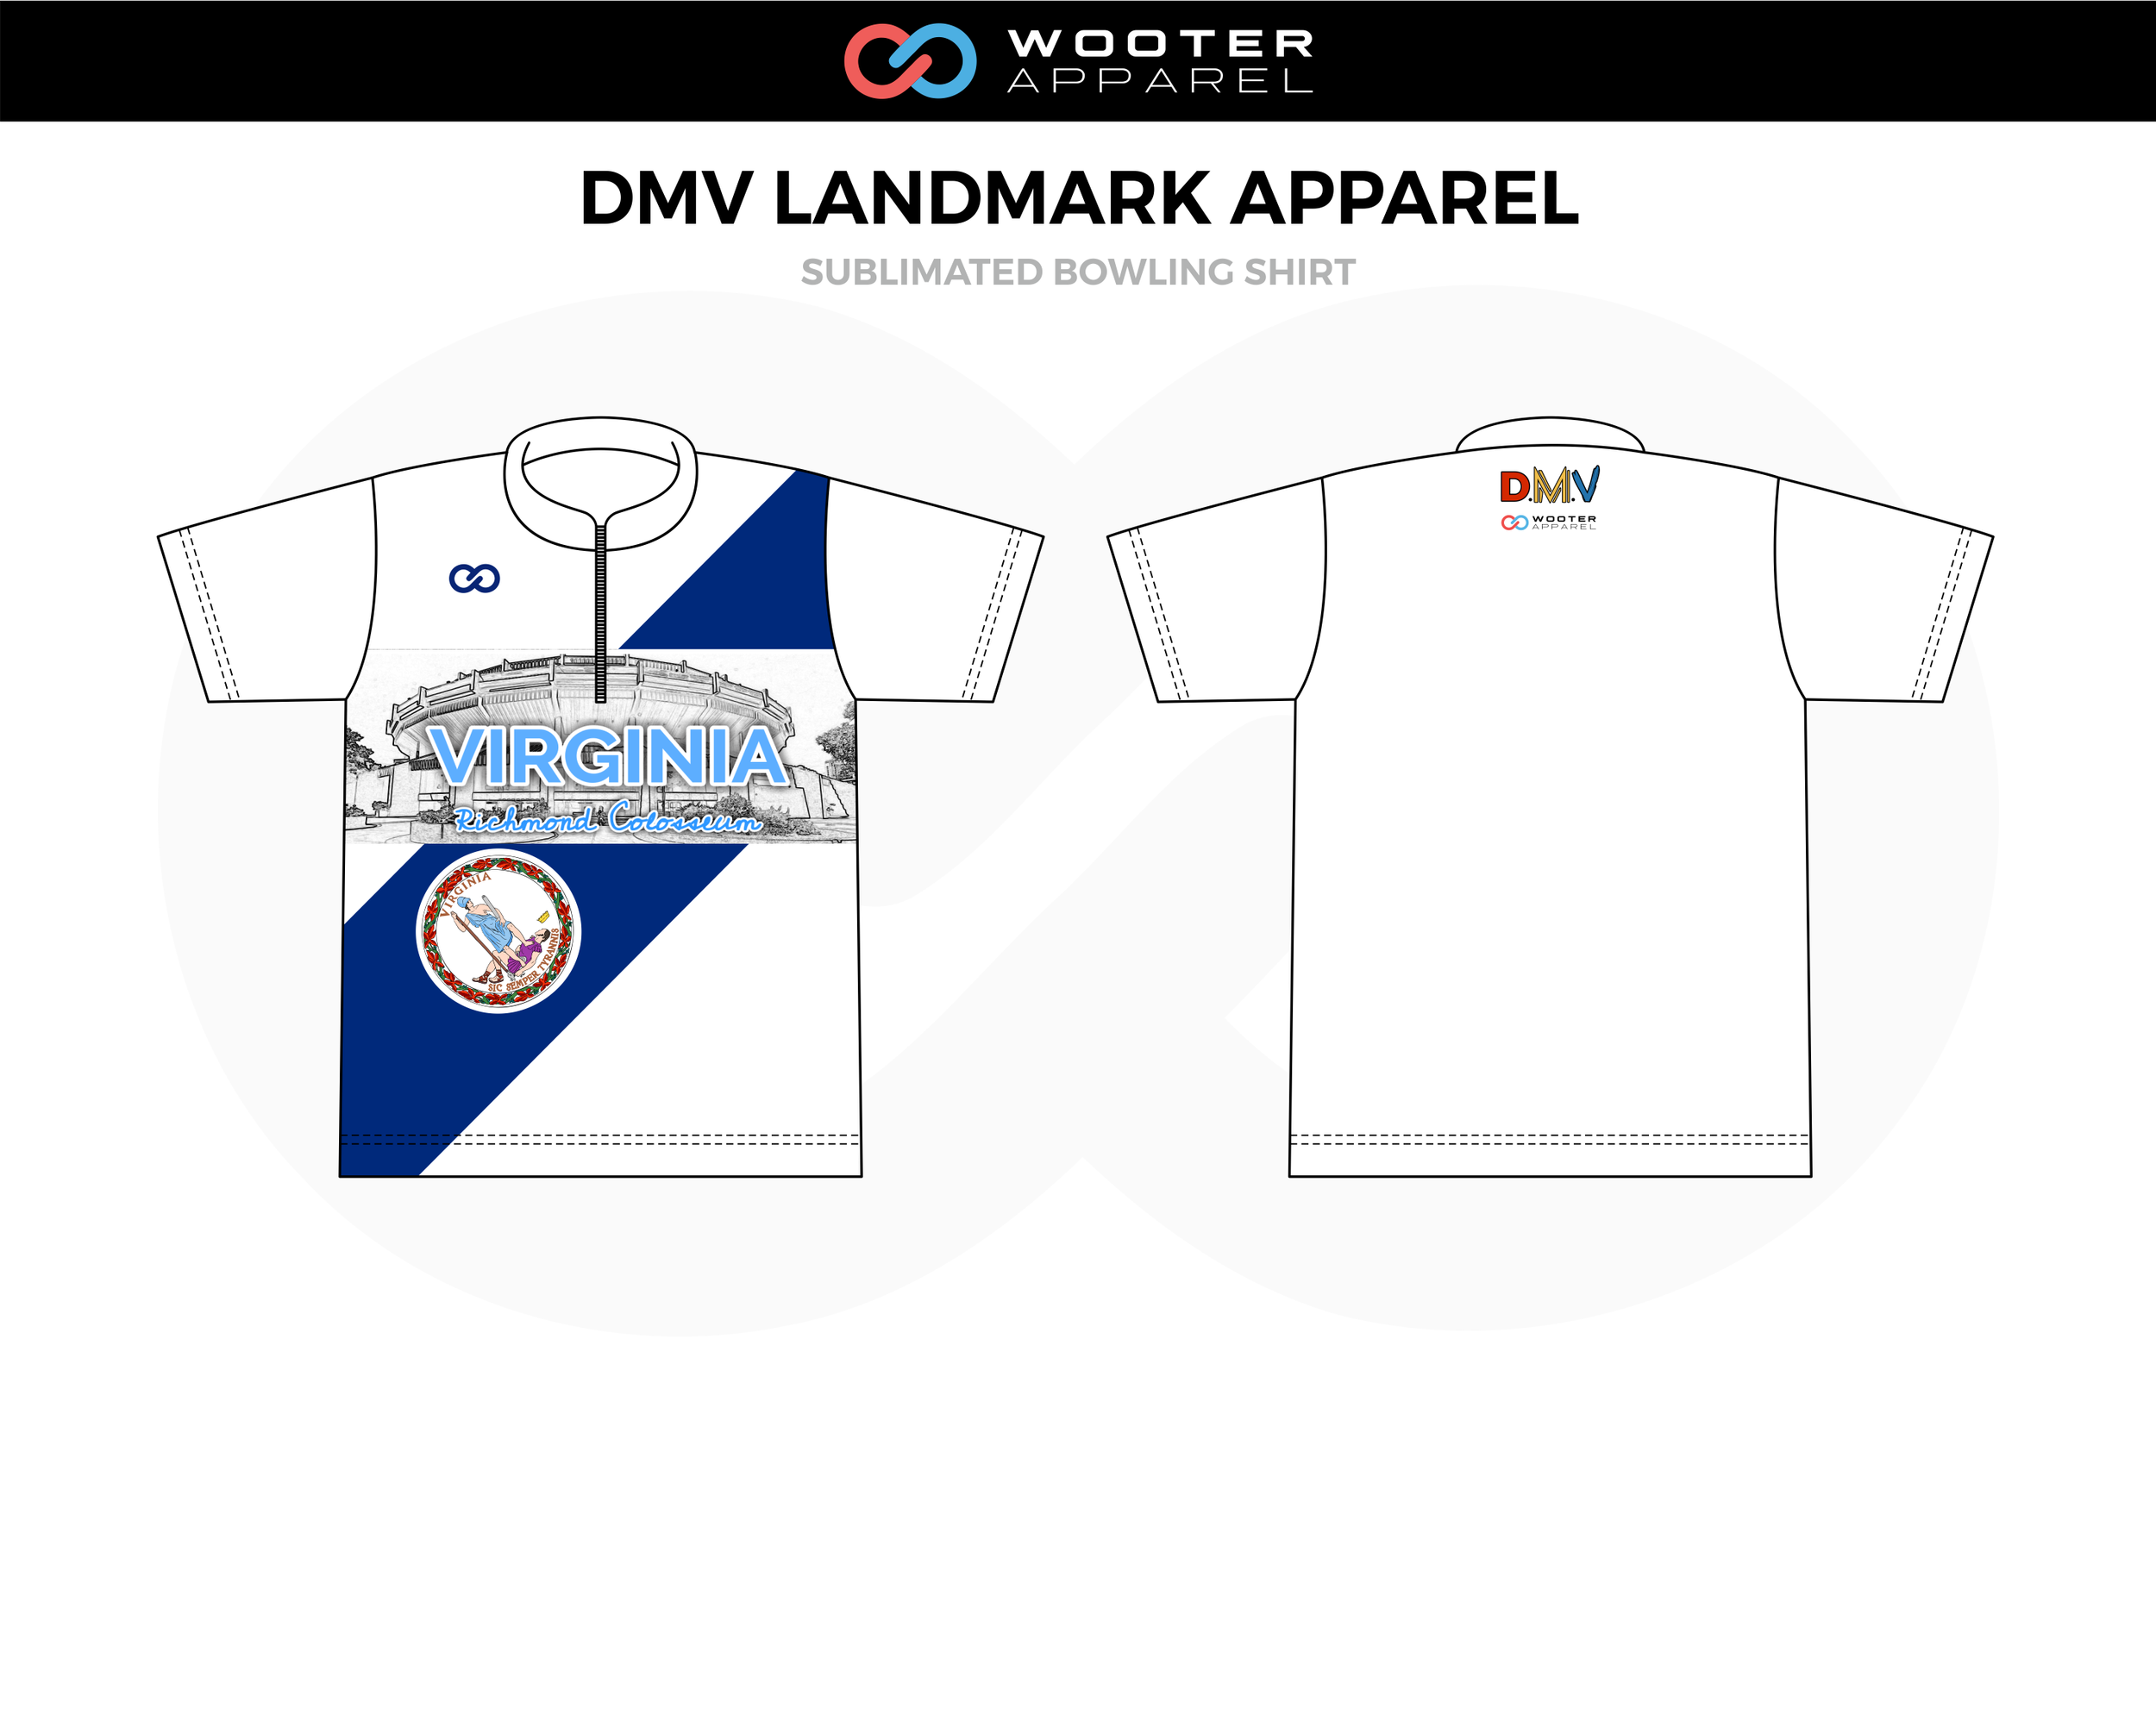 DMV LANDMARK APPAREL White Blue Black Bowling Shirt